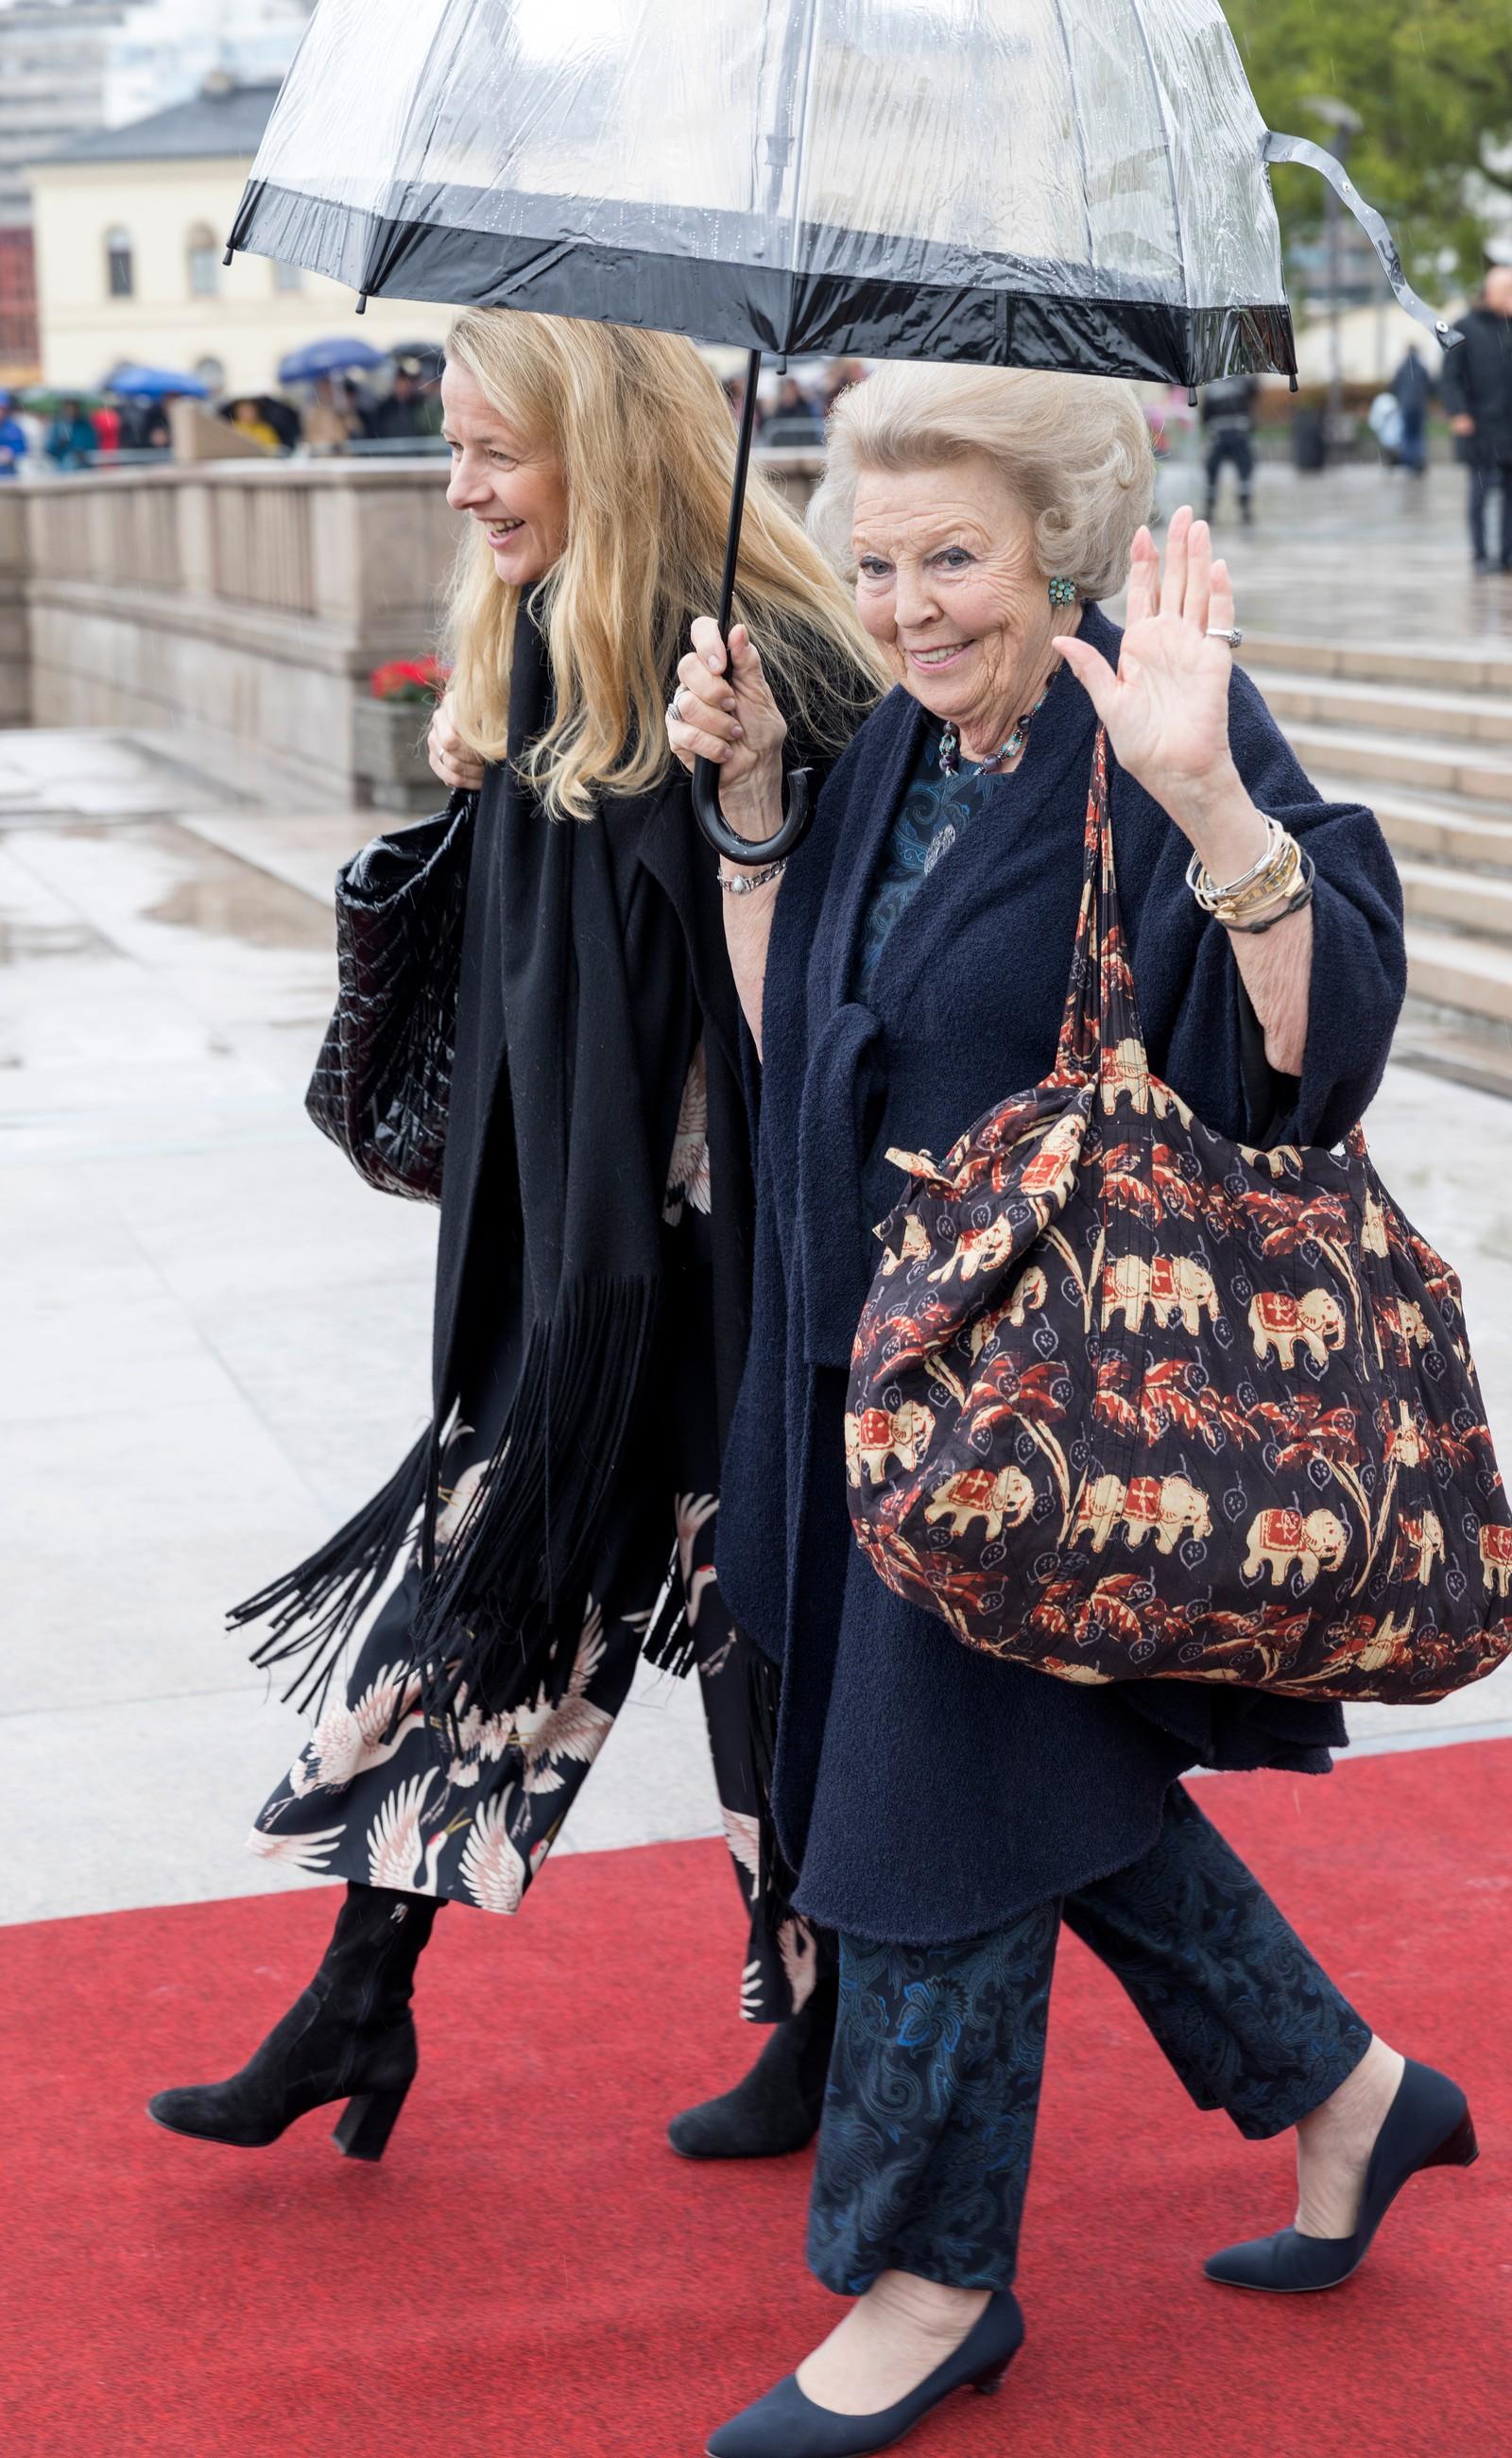 Prinsesse Mabel, prinsesse Beatrix ved avreise fra honnørbrygga i Oslo på tur til lunsj på Kongeskipet Norge onsdag.